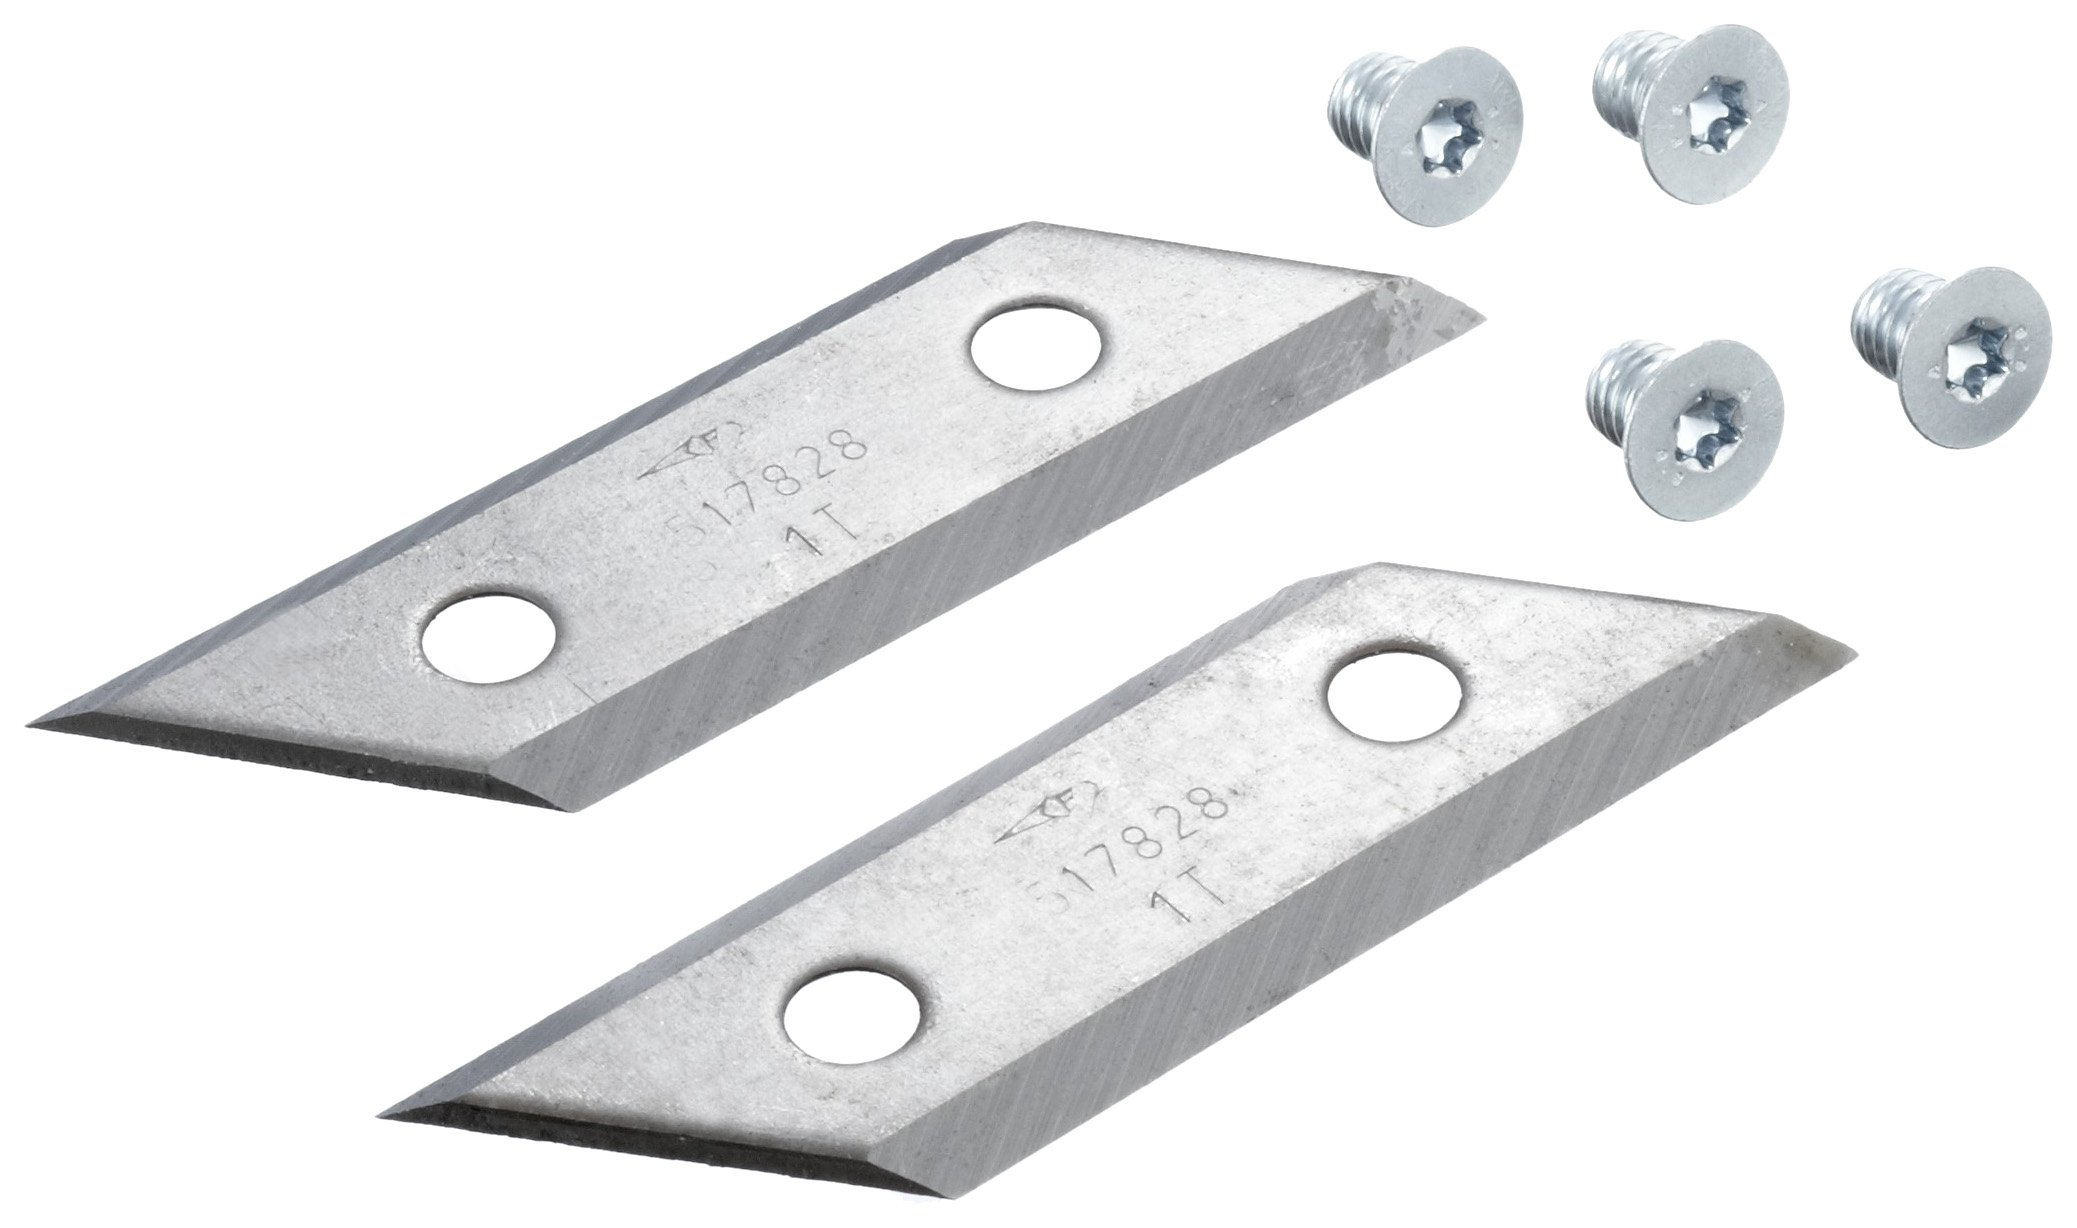 AL-KO-103264-Hauptmessersatz-fr-alle-Dynamic-Micro-Power-Slider-New-Tec-2500-R